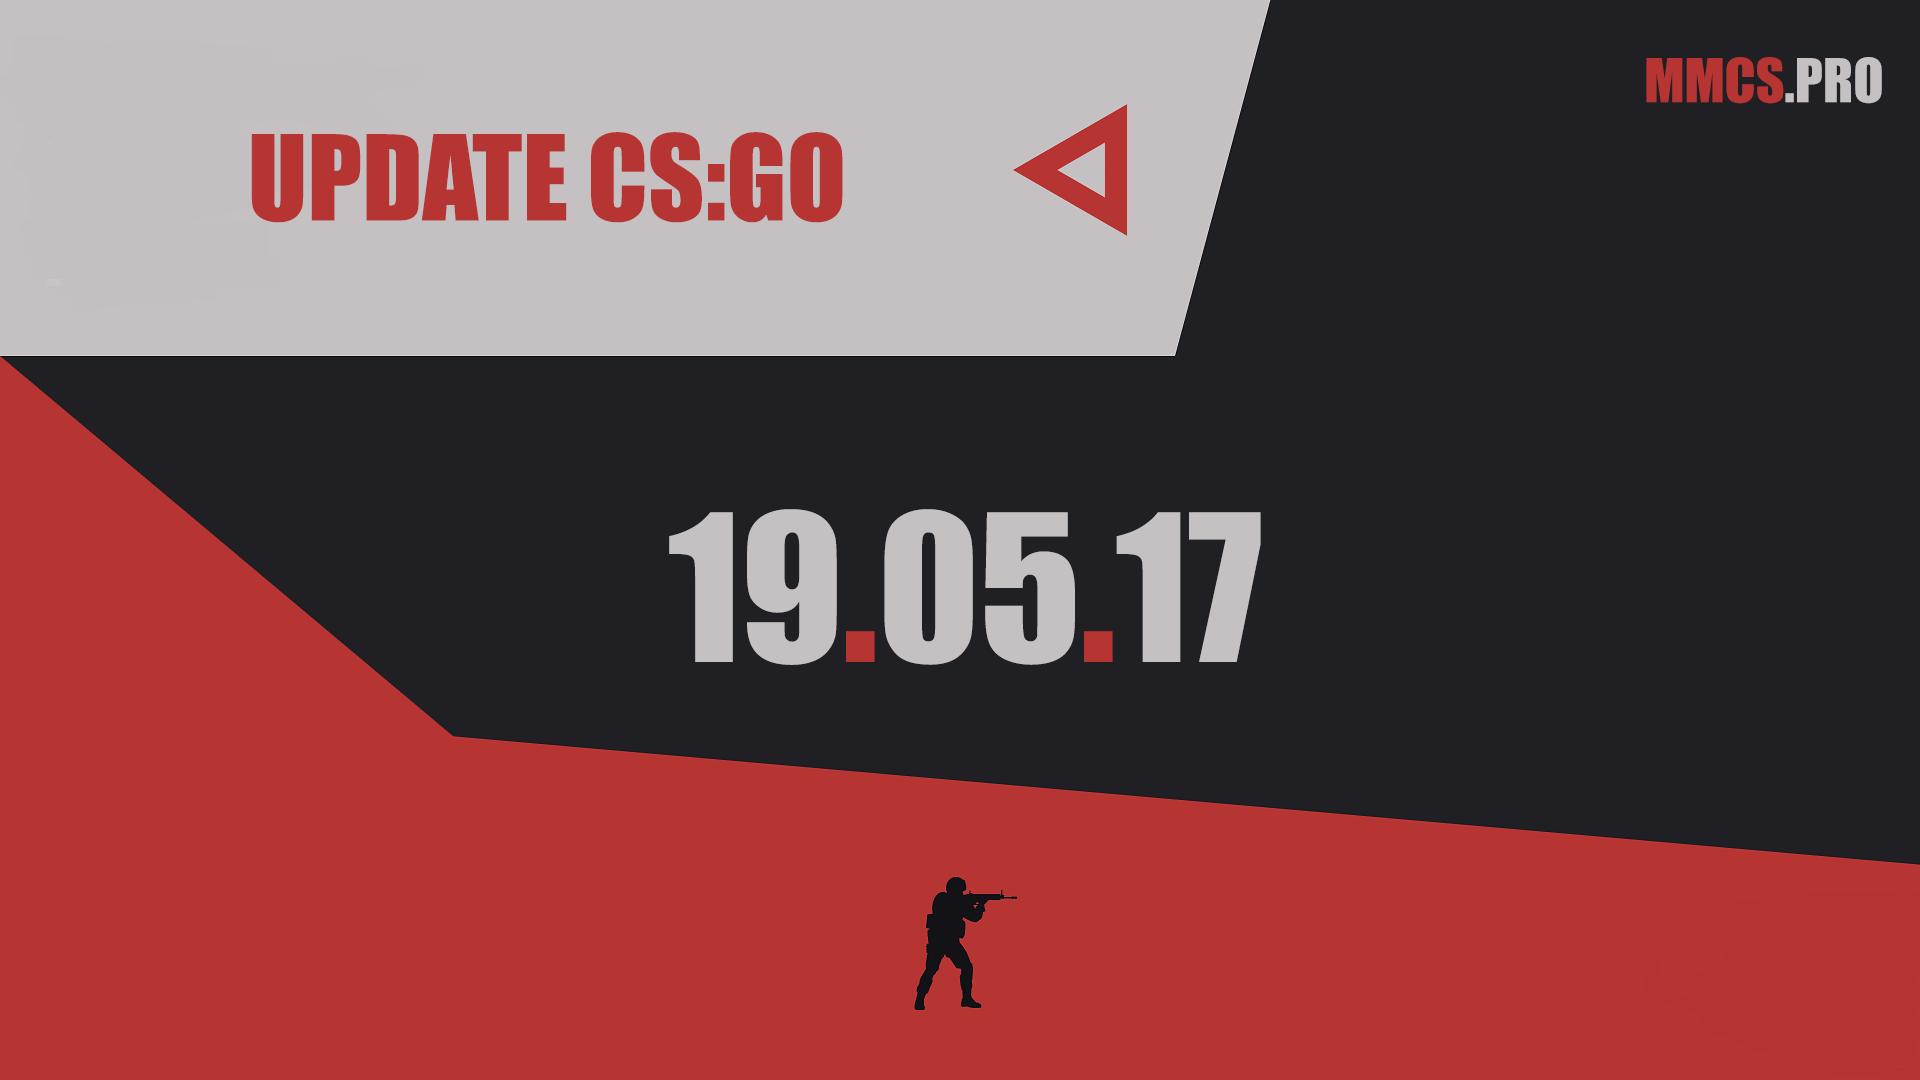 https://mmcs.pro/update-csgo-19-05-2017-valve/